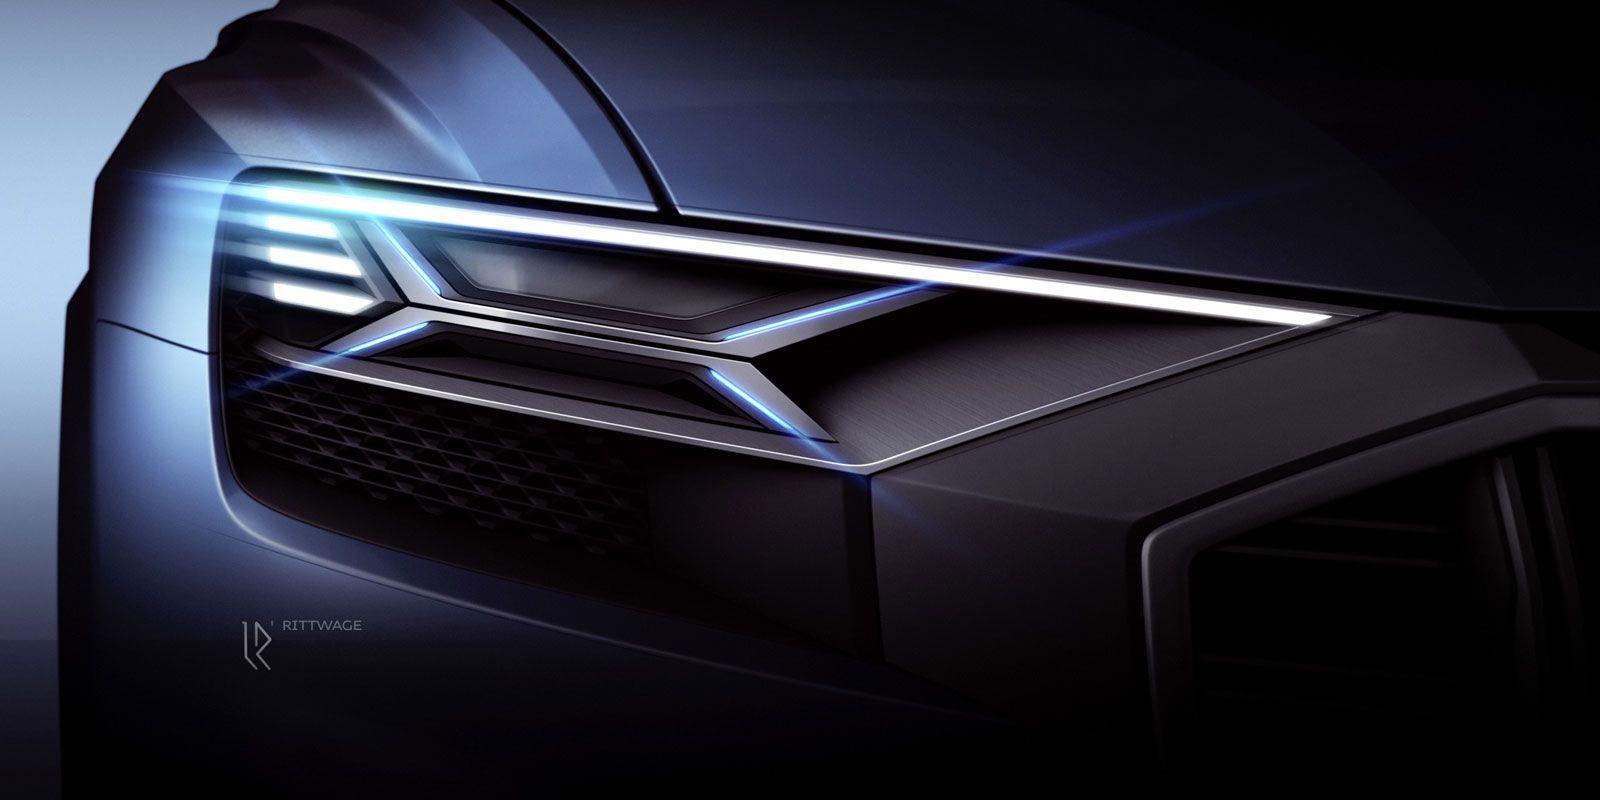 Frontlicht design audi q concept design sketch render headlight  cars  details